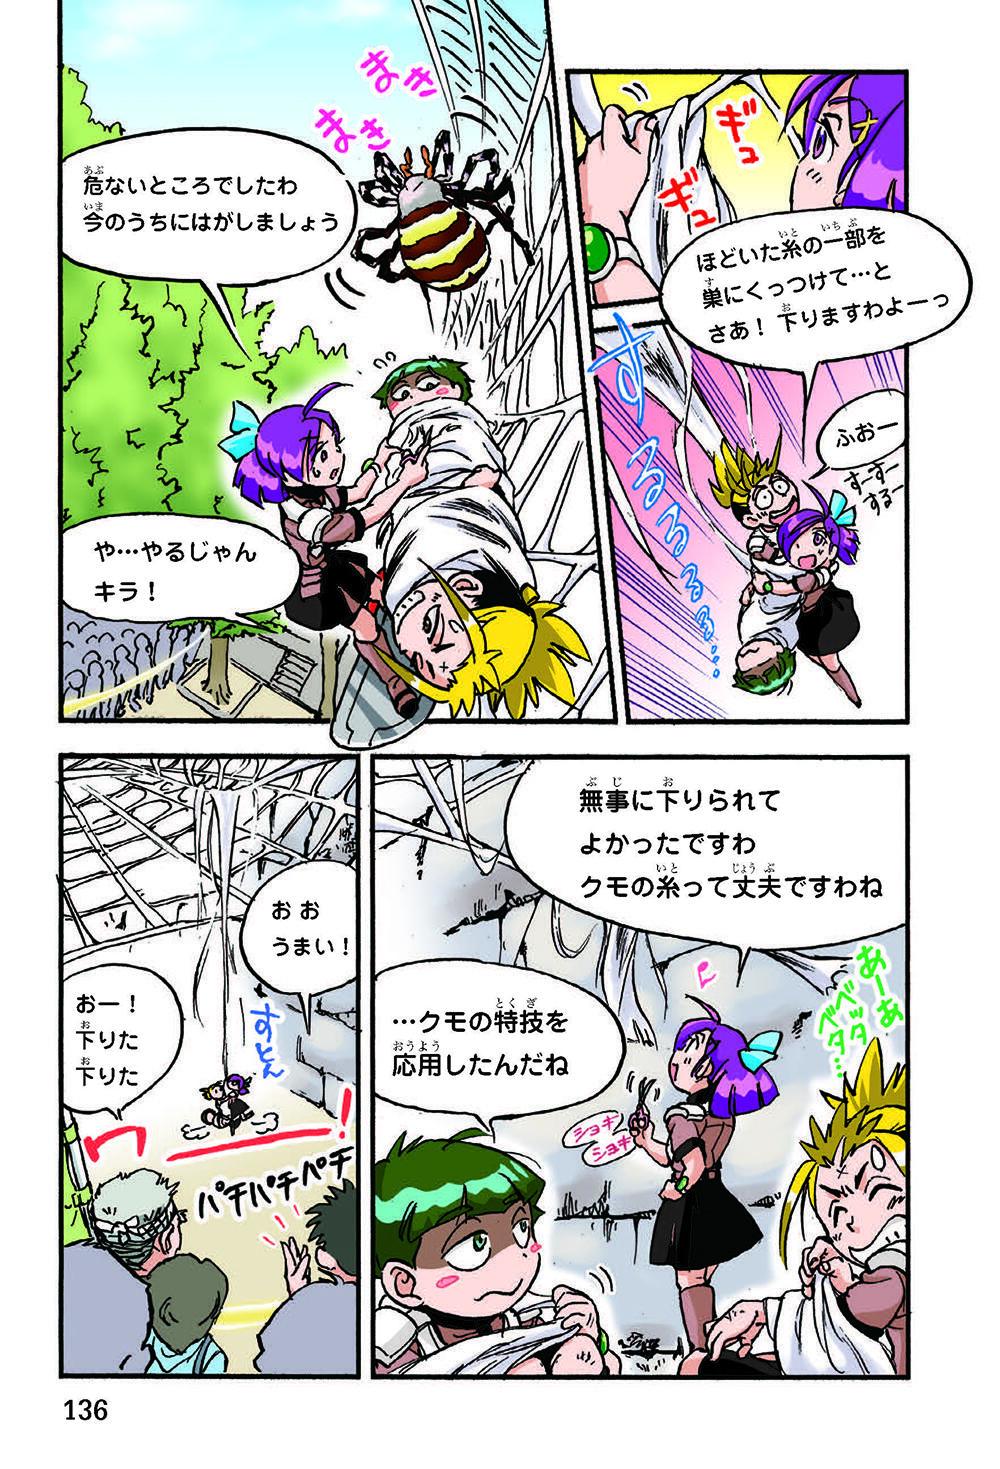 BB_蜊ア髯コ逕溽黄_繝倥z繝シ繧キ繧兩136.jpg